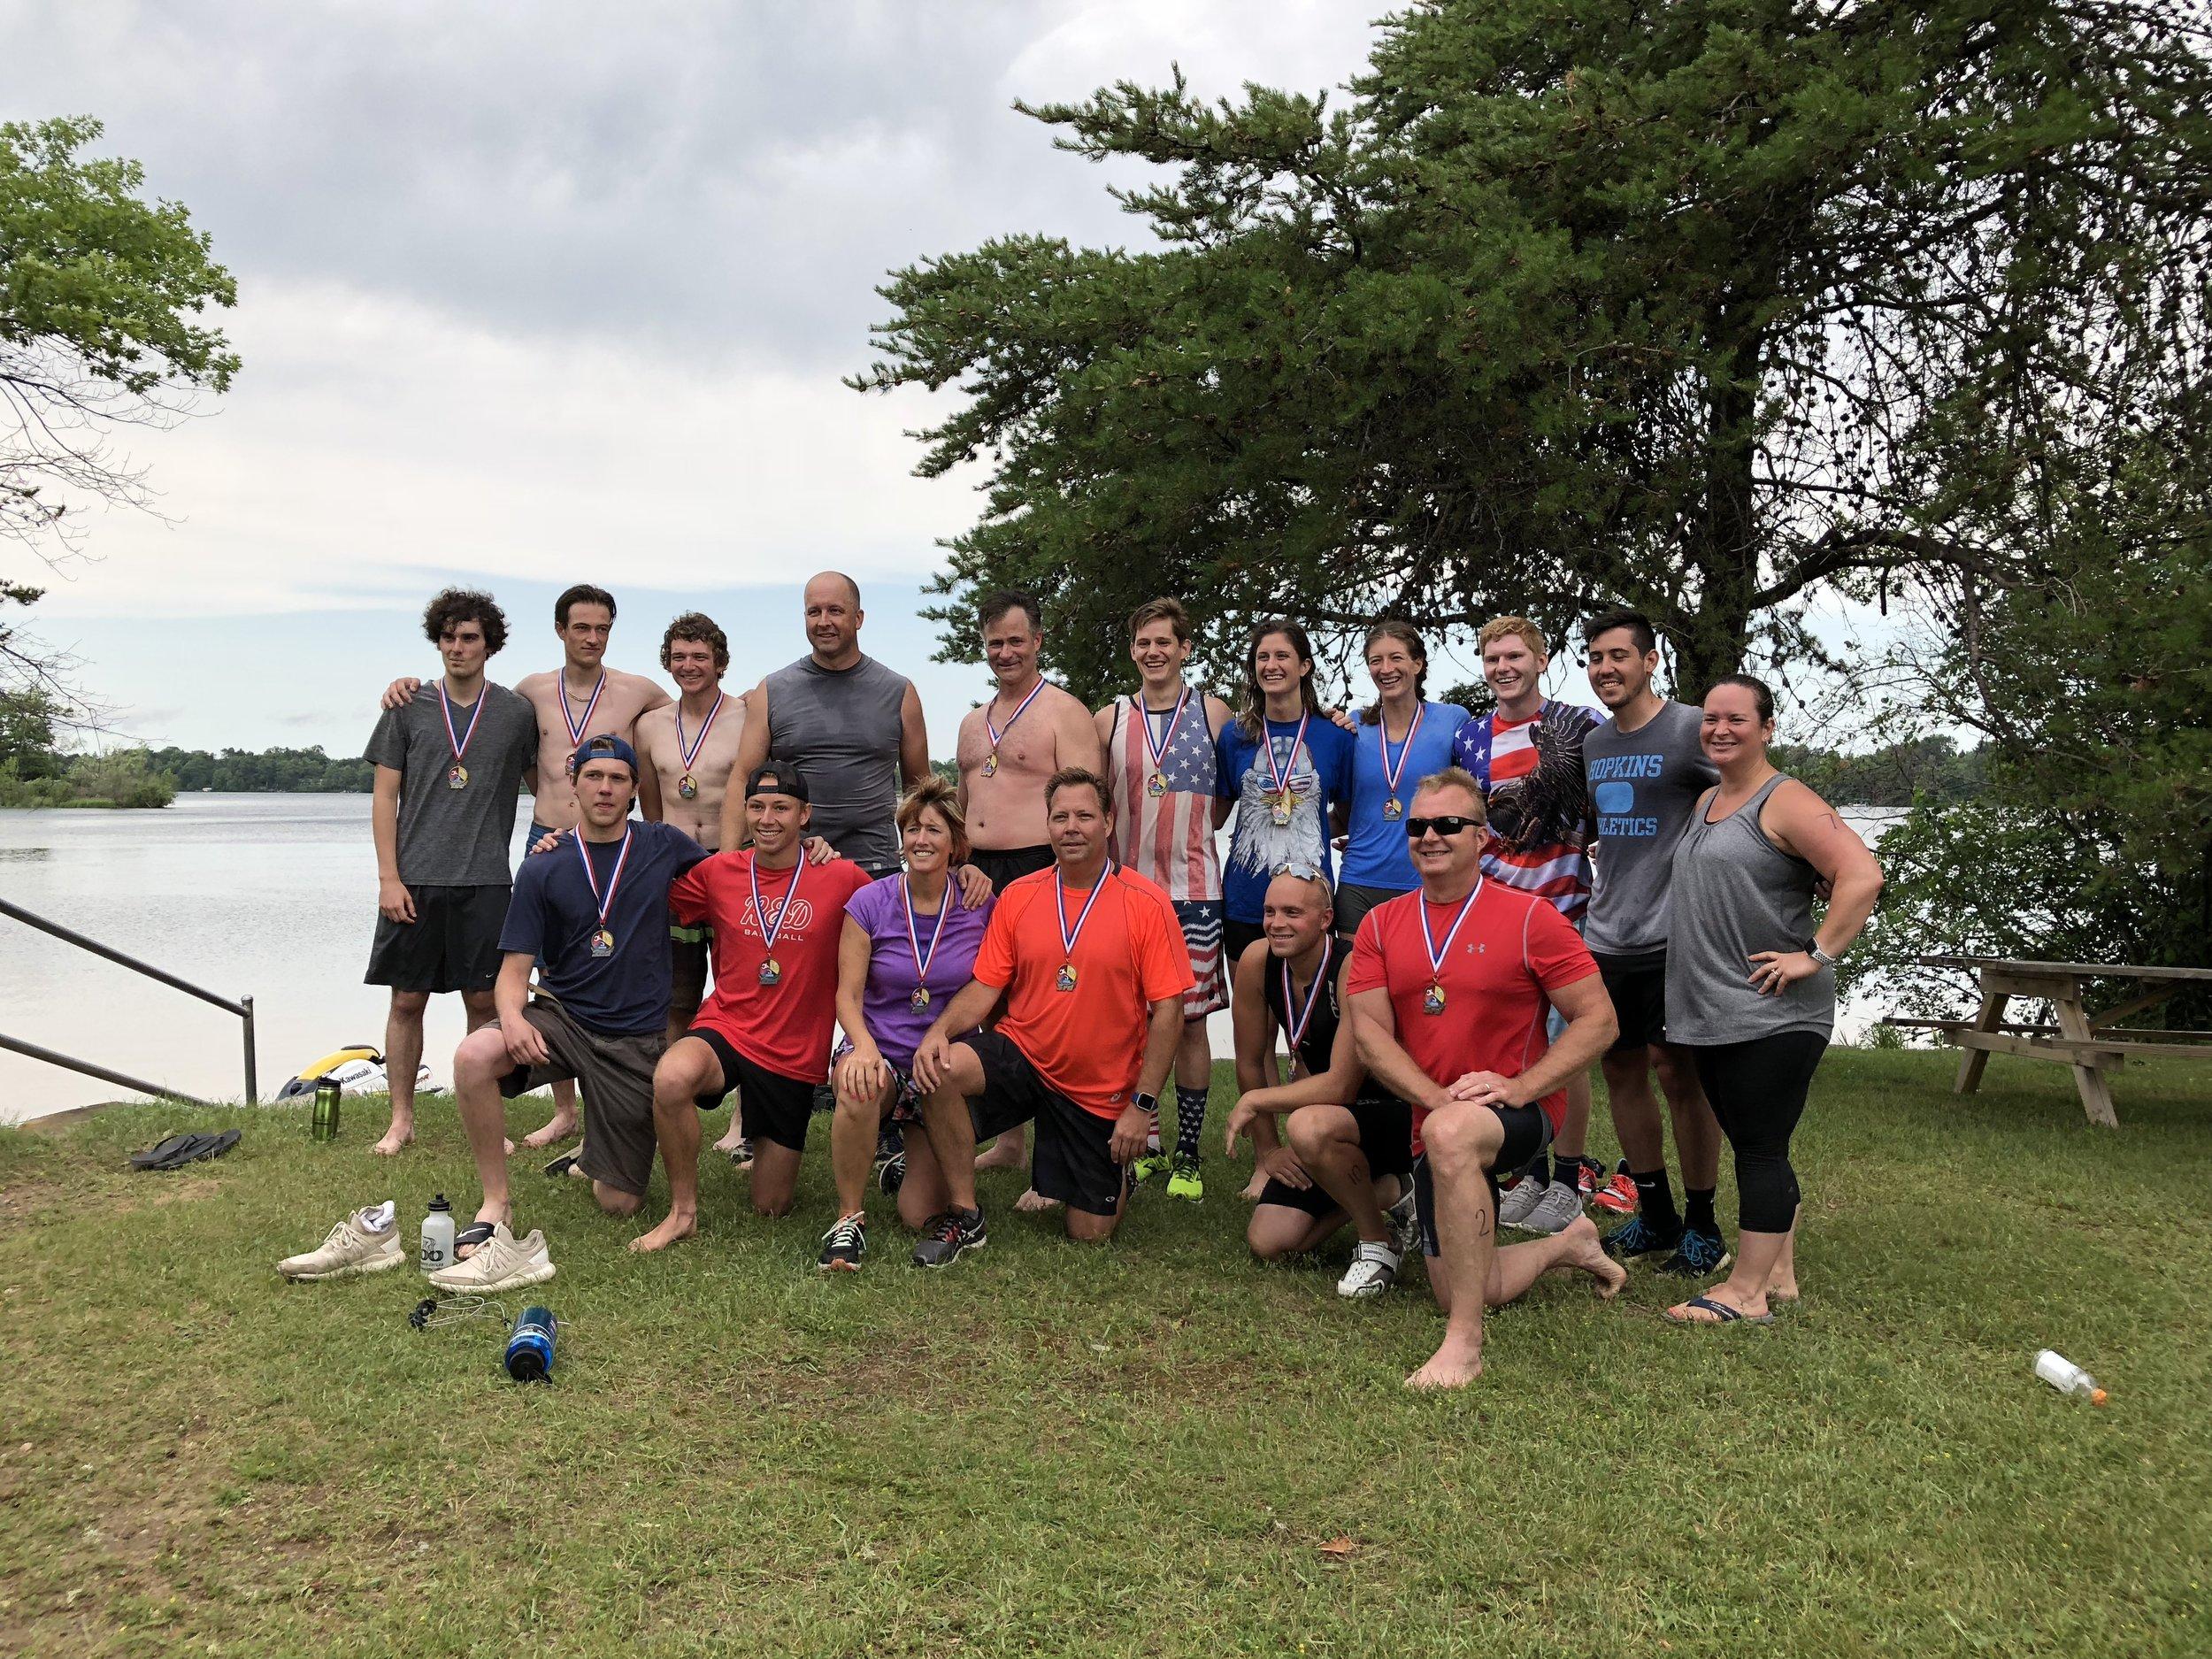 2018 Triathlon Participants